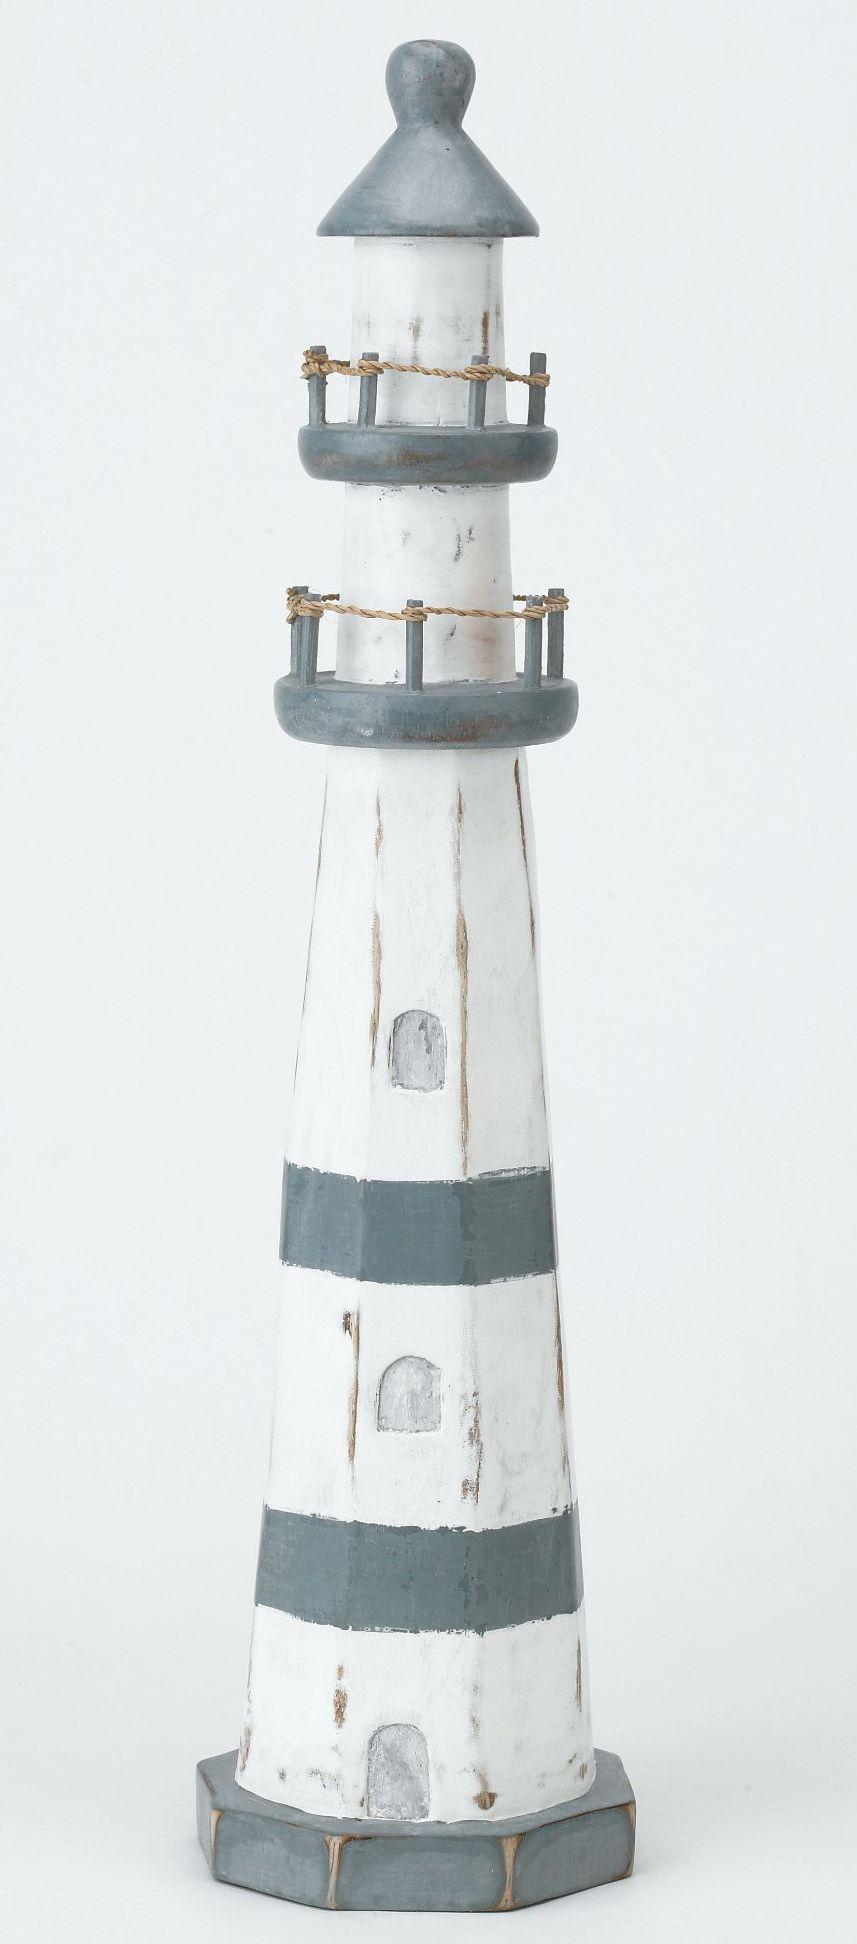 Archipelago Wooden Lighthouse Blue and White - Large